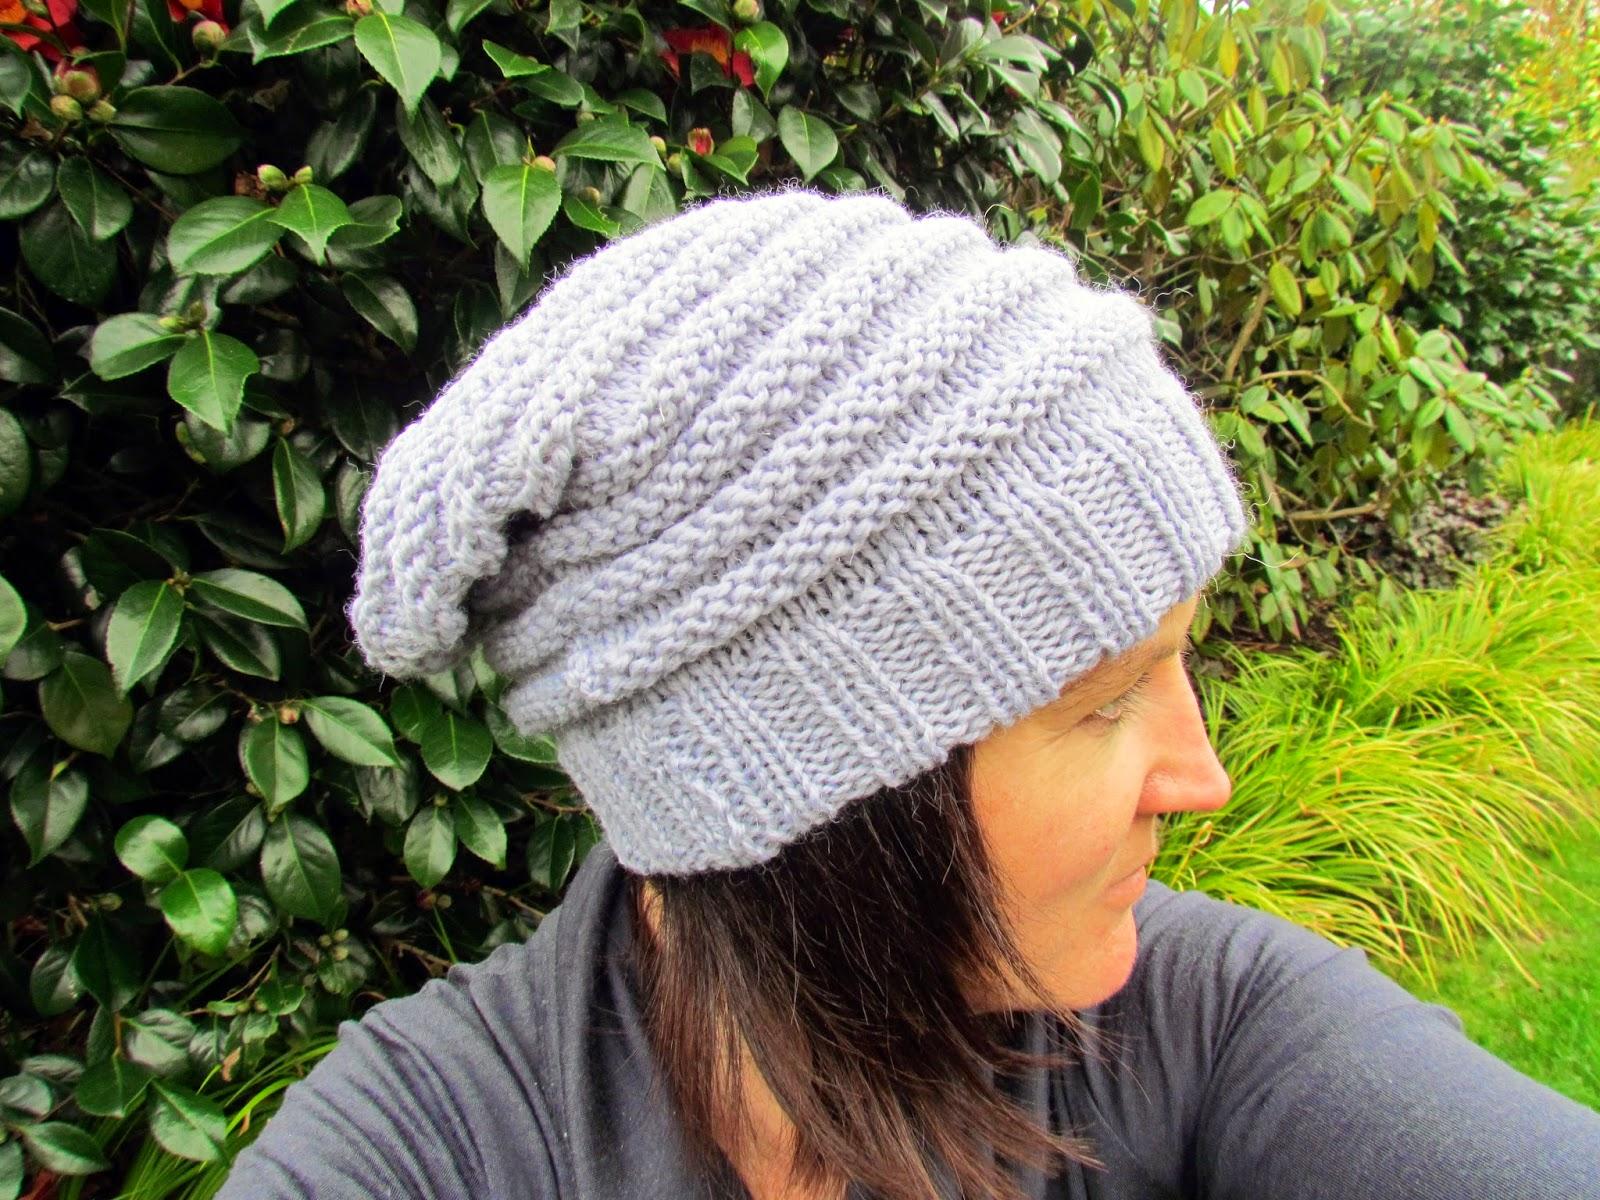 Knitting Pattern Floppy Beanie : A Slouchy Beanie